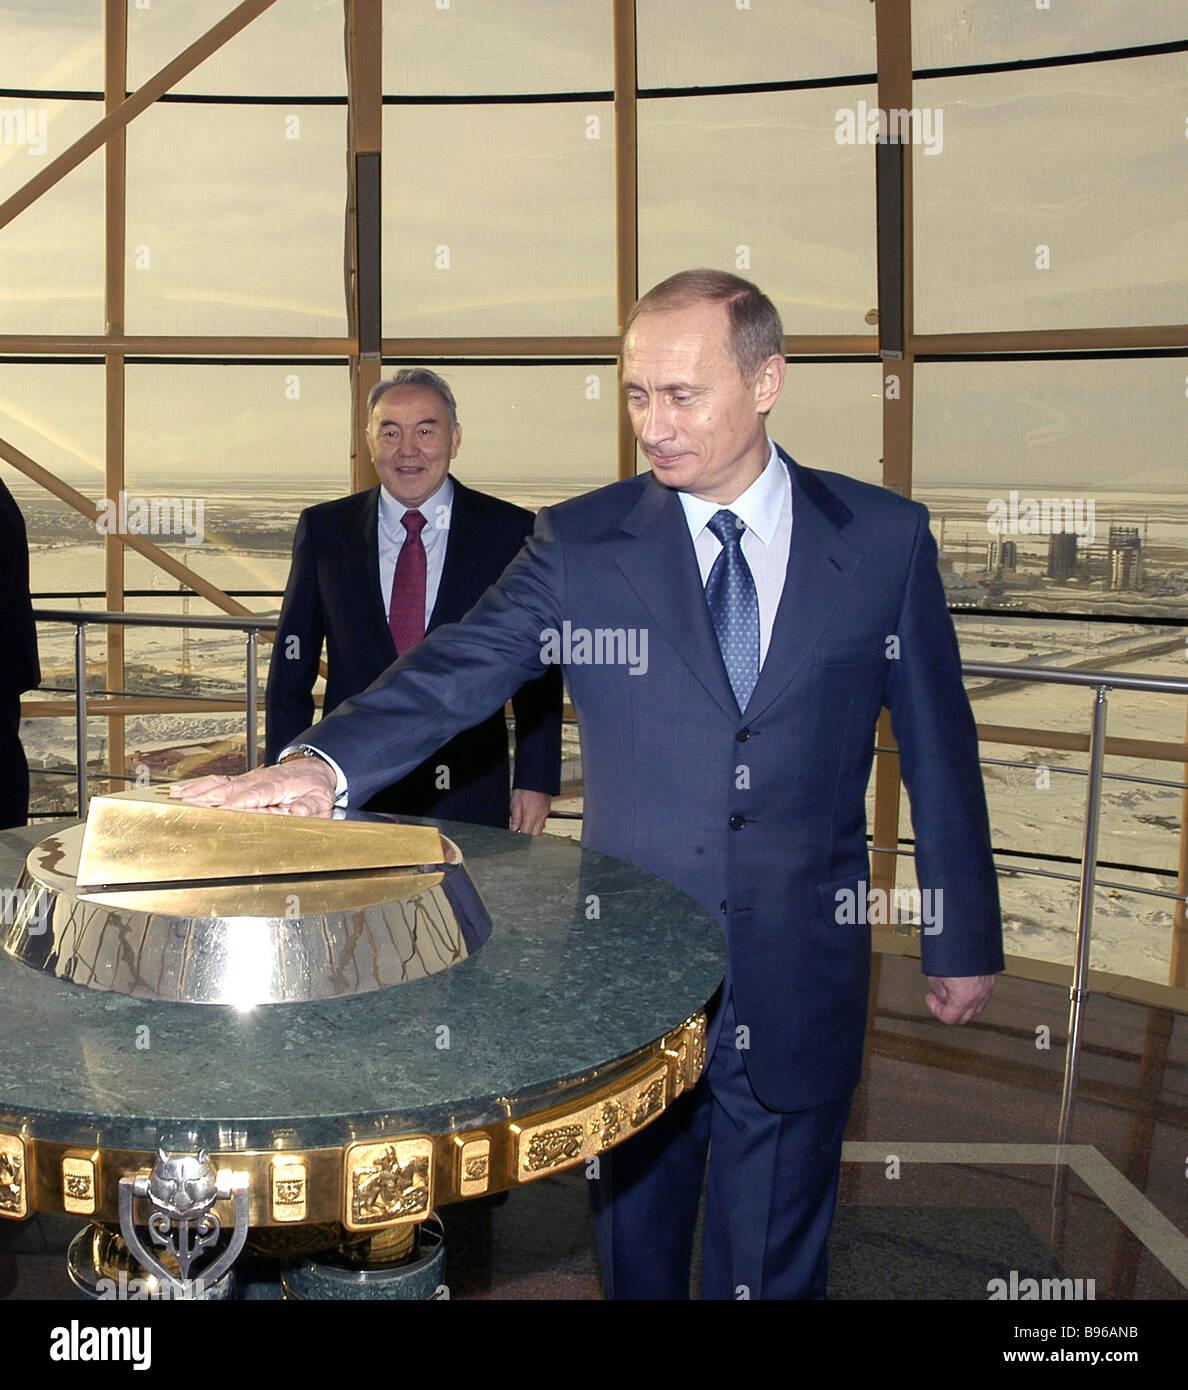 Russian President Vladimir Putin accompanied by Kazakh President Nursultan Nazarbayev admires monument Astana Baiterik - Stock Image